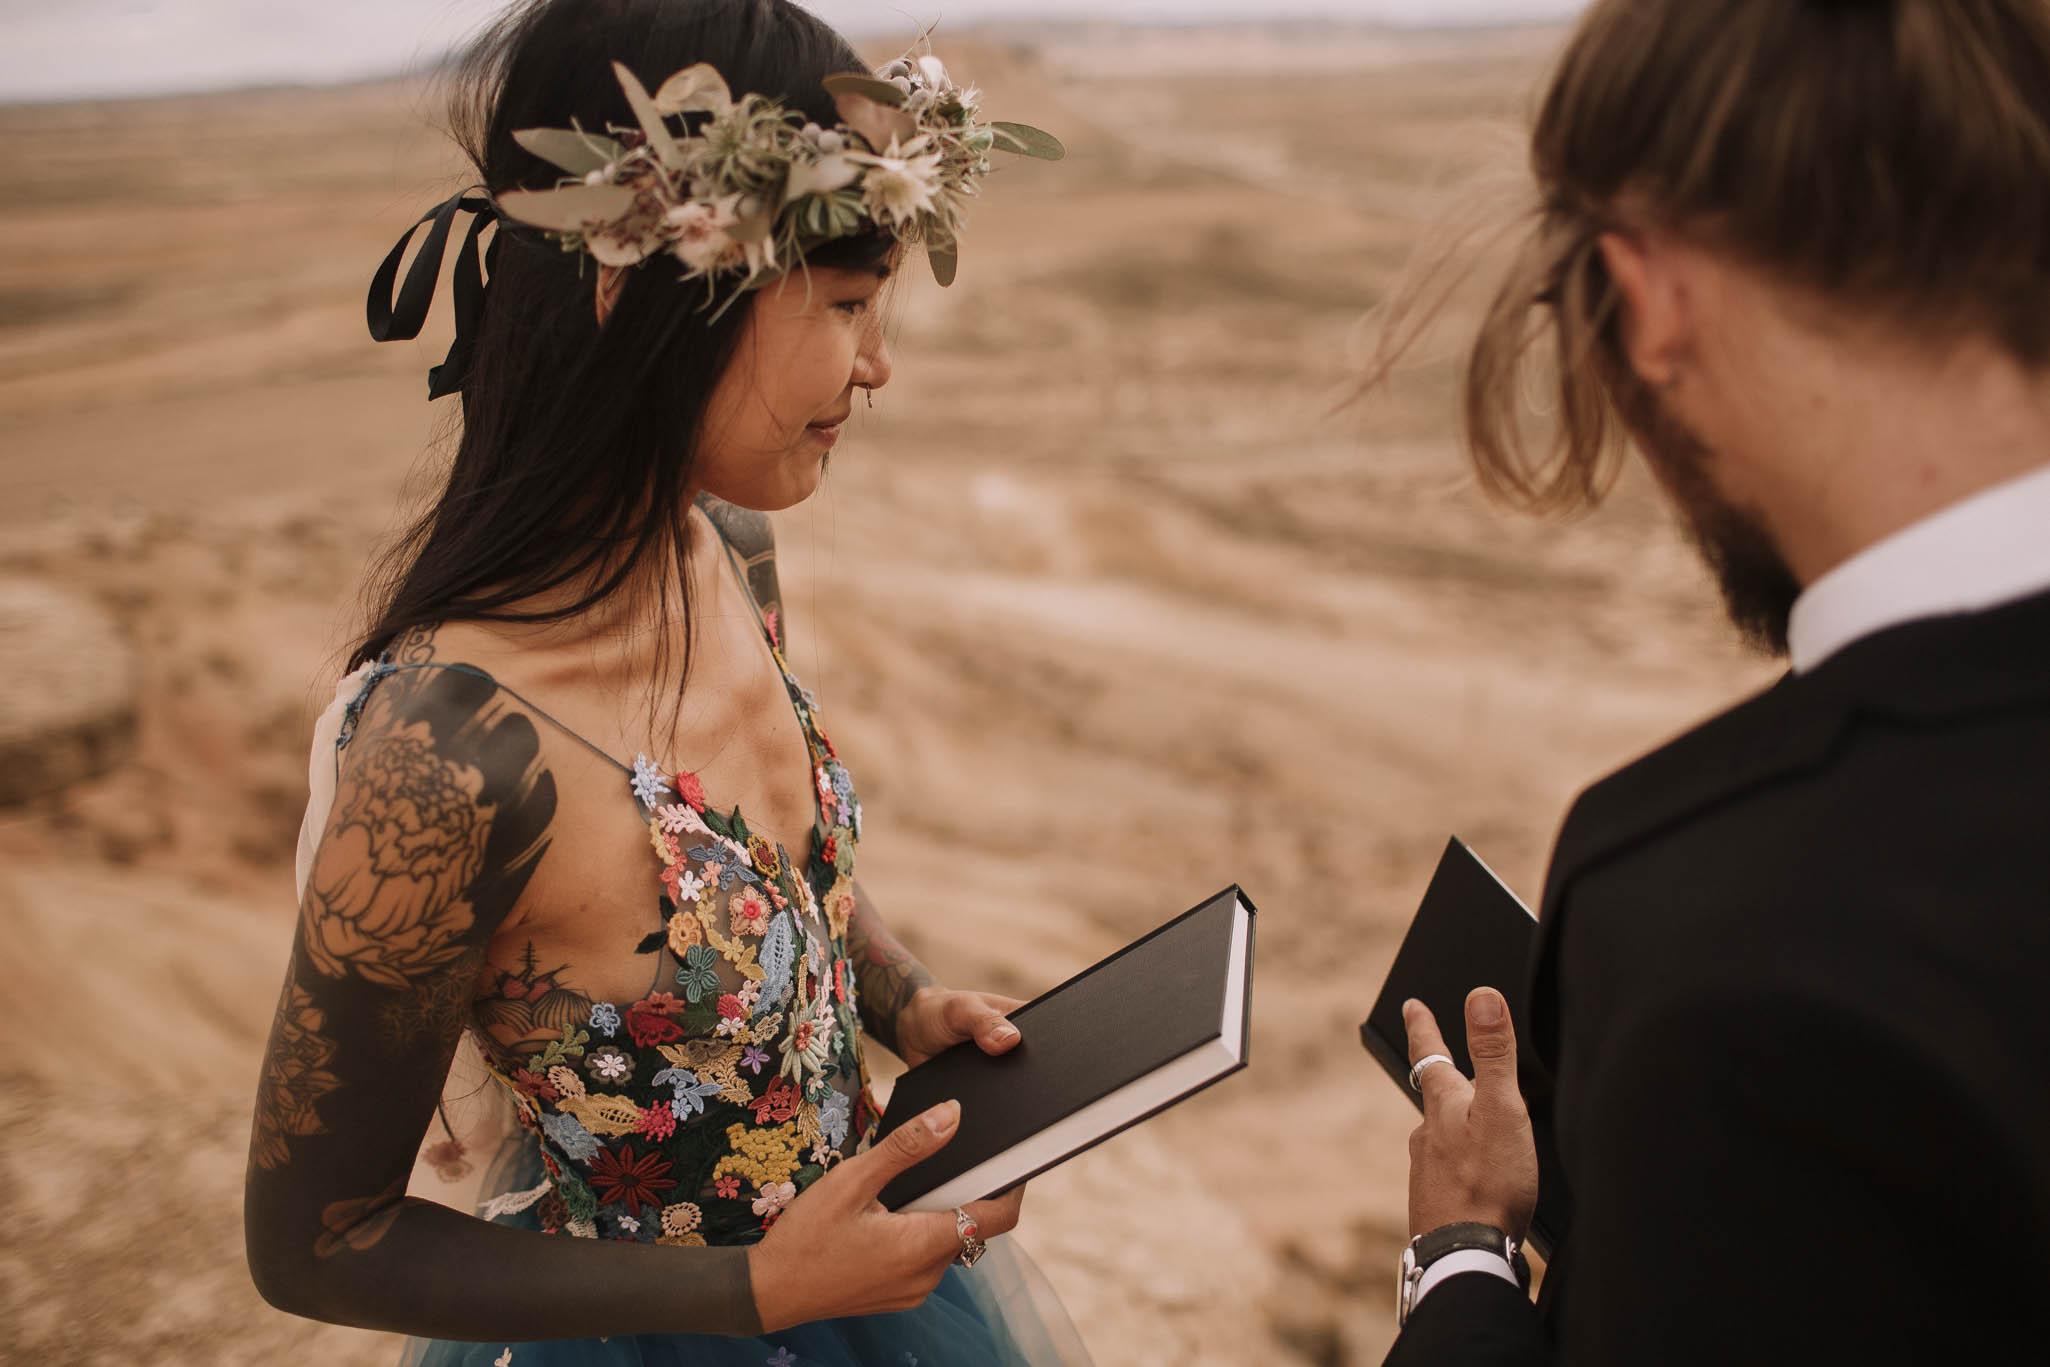 Spain-wedding-photographer-bardenas-reales-jeremy-boyer-photographe-mariage-bordeaux-floral-wedding-dress-robe-103.jpg